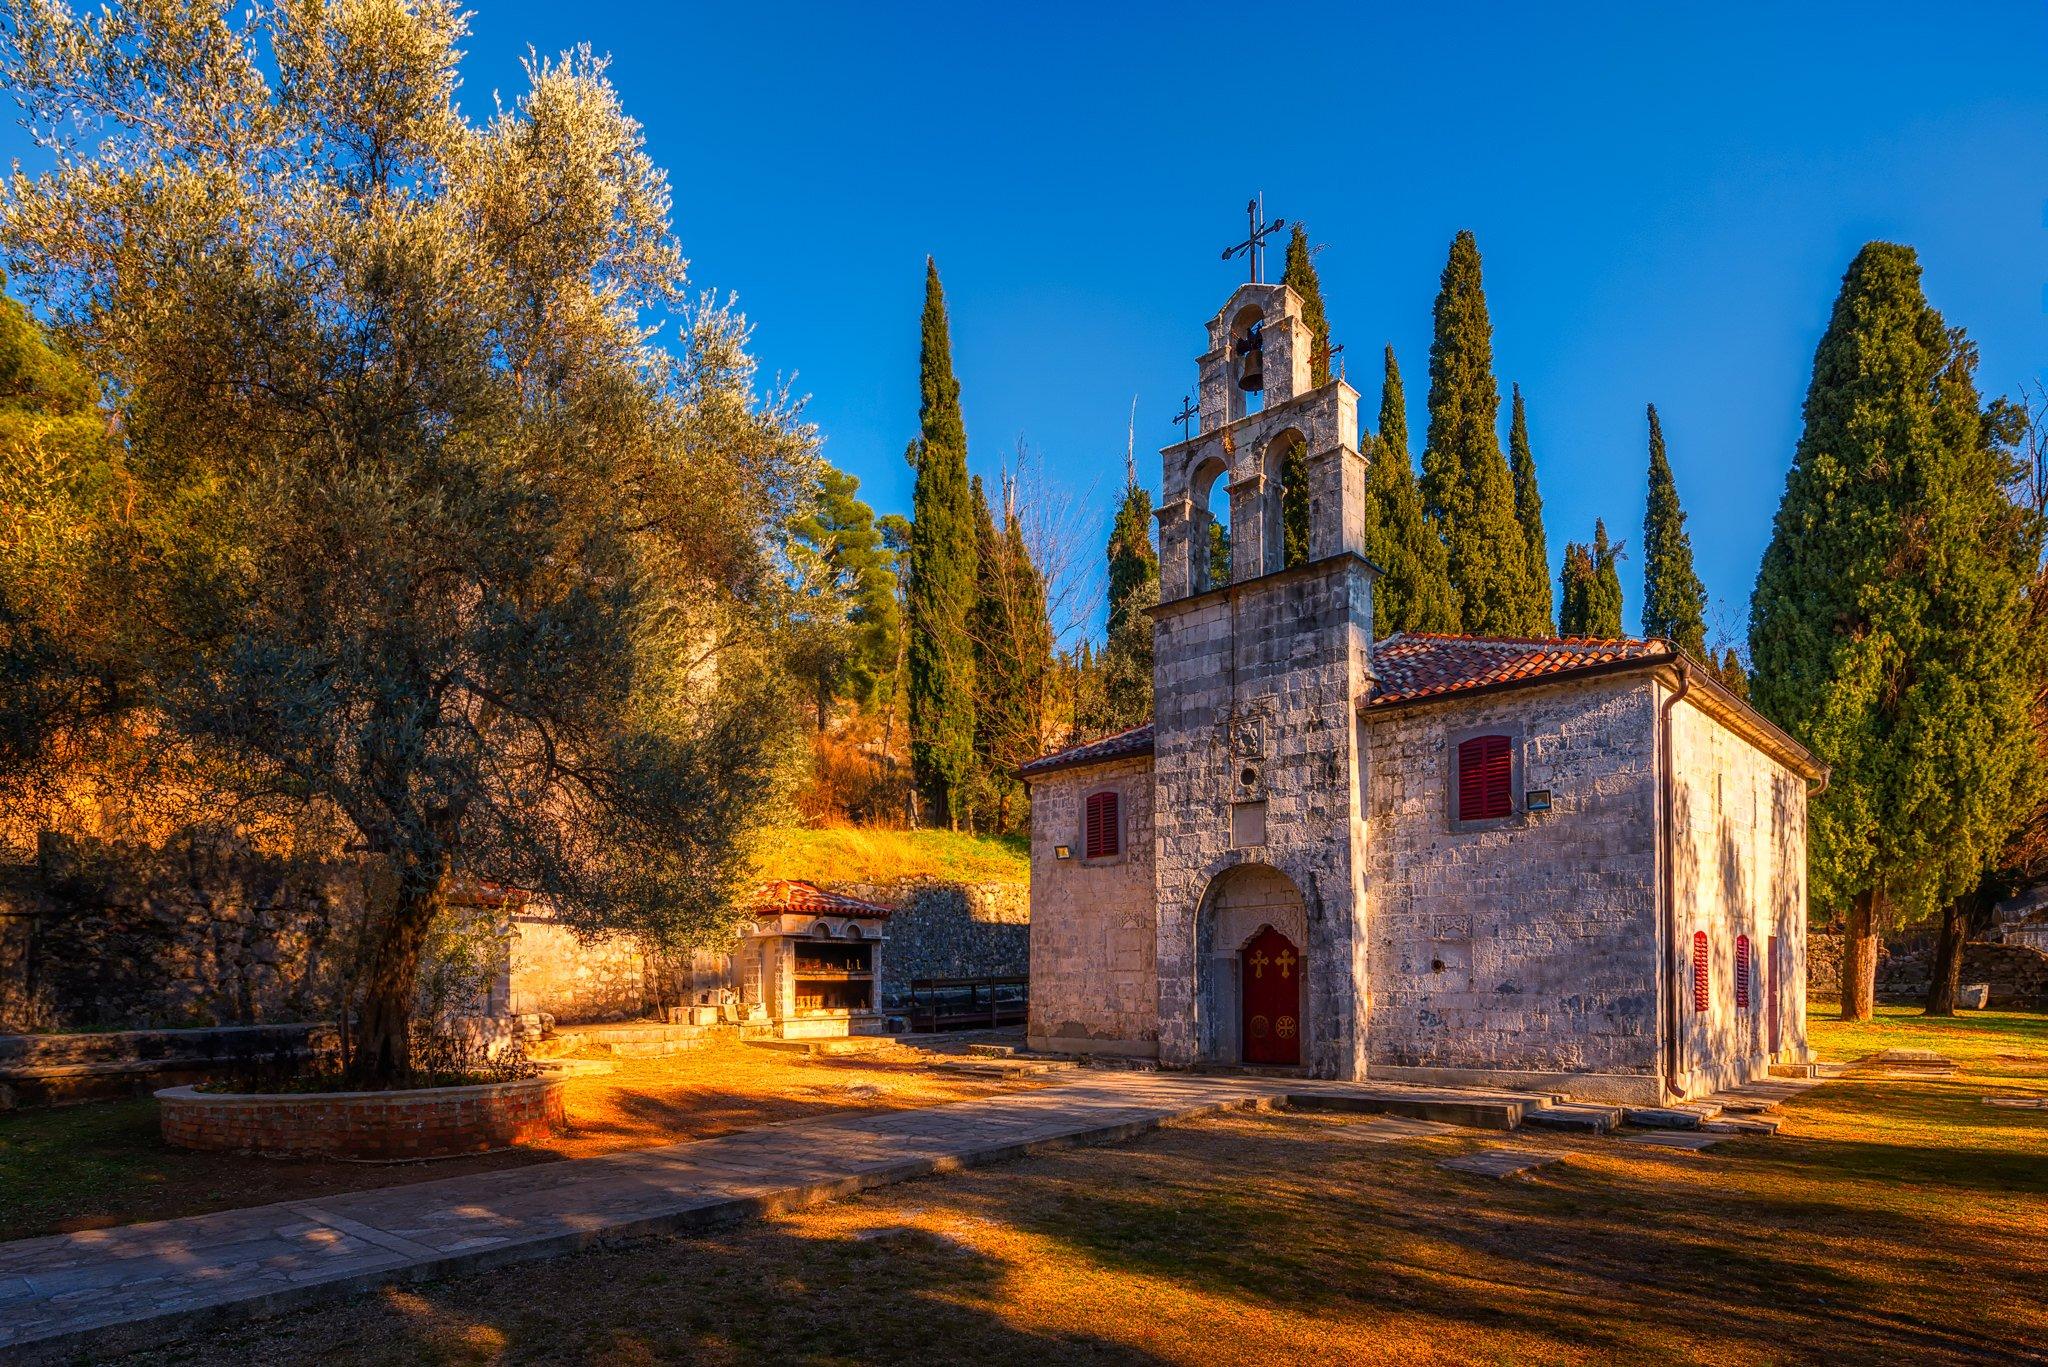 Podgorica Church of St. George and Park around Gorica hill, Montenegro.